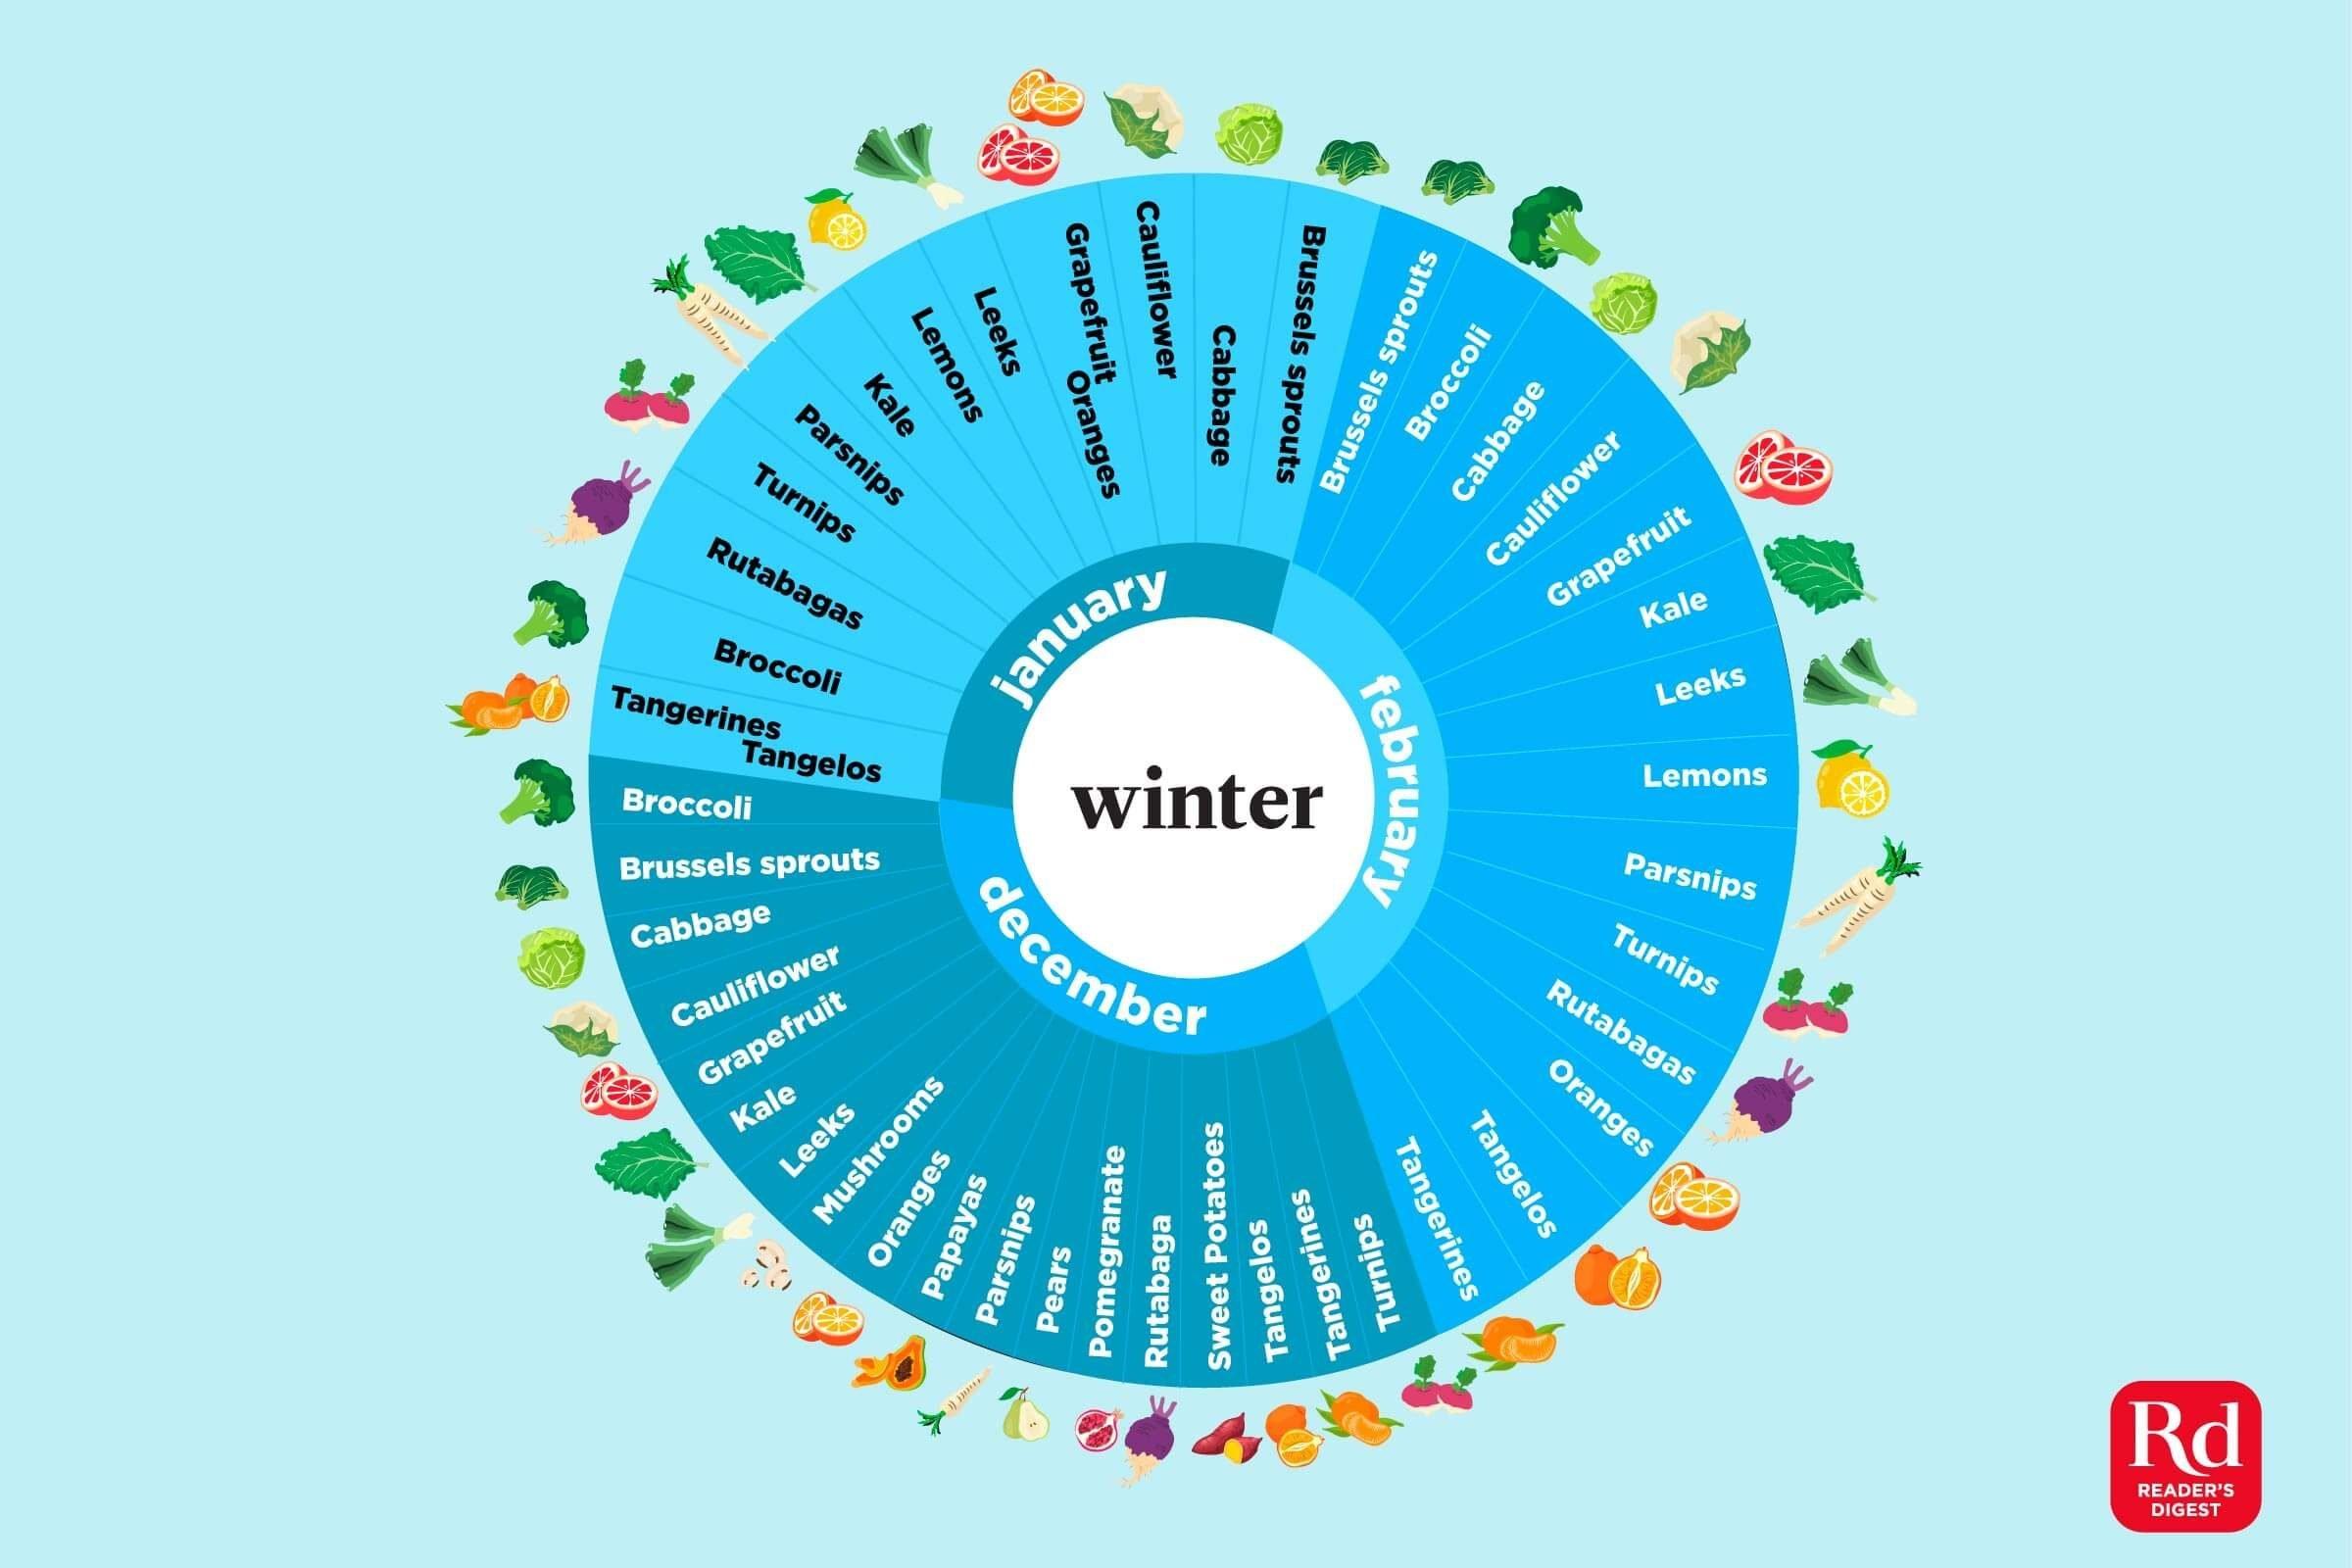 Illustration of in-season winter produce.